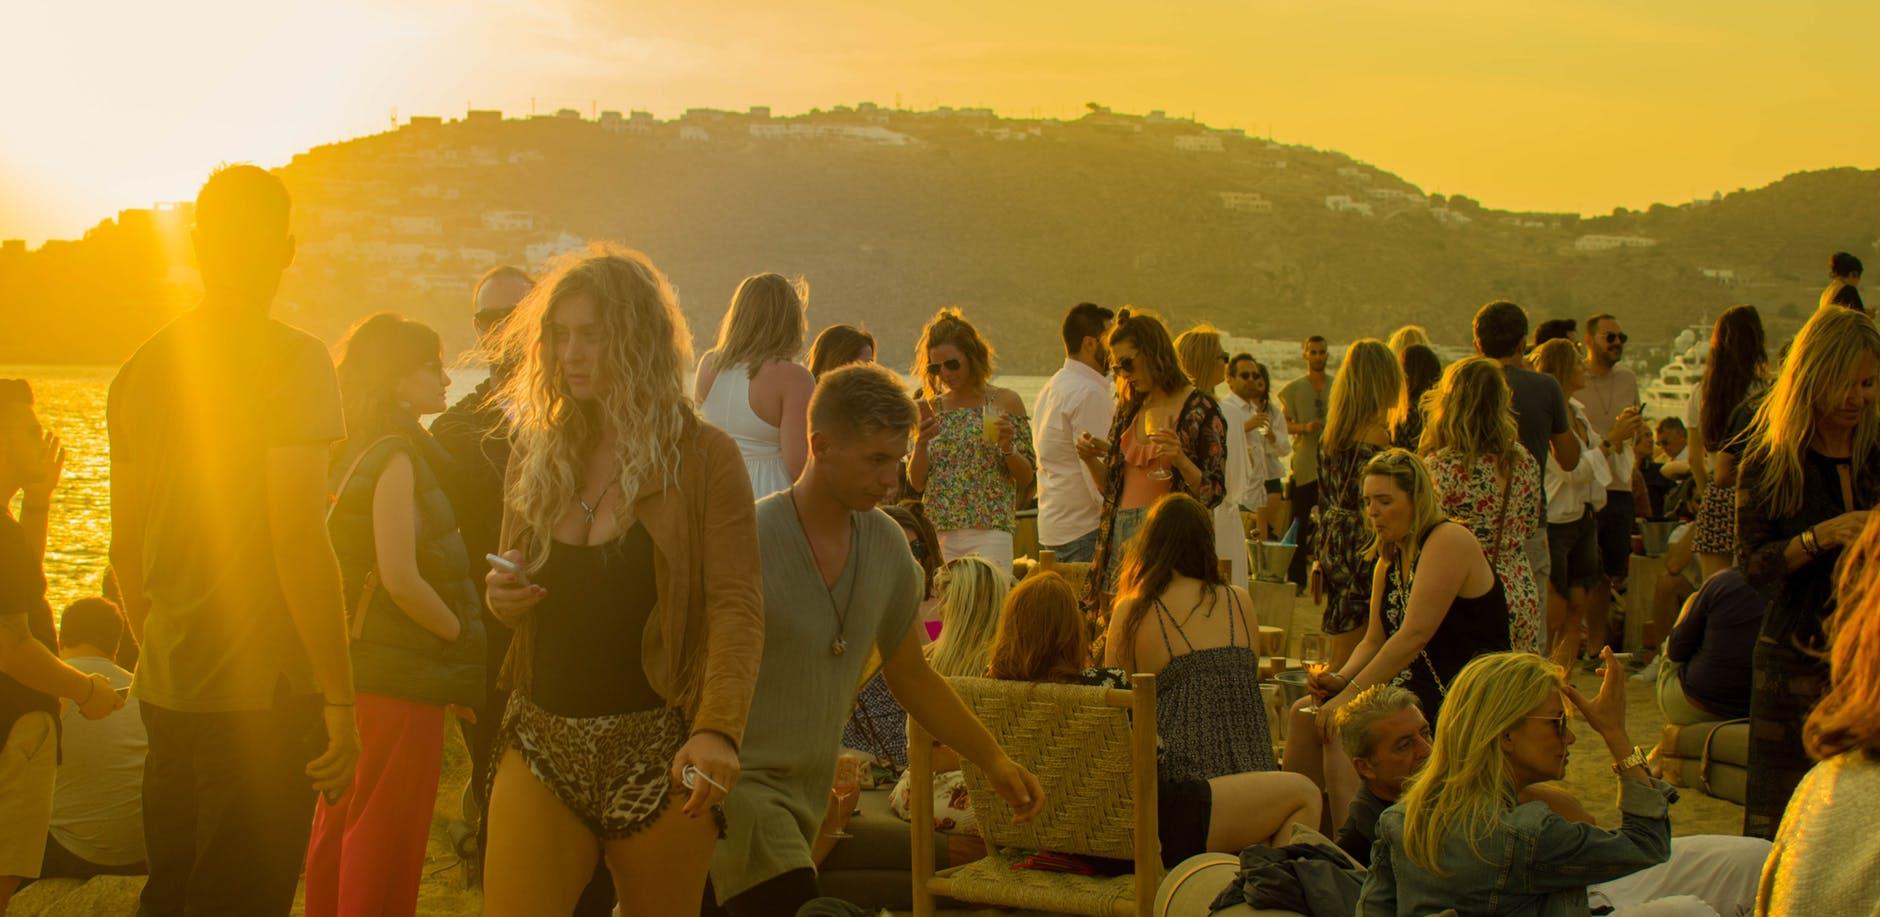 Summer festivals in Europe